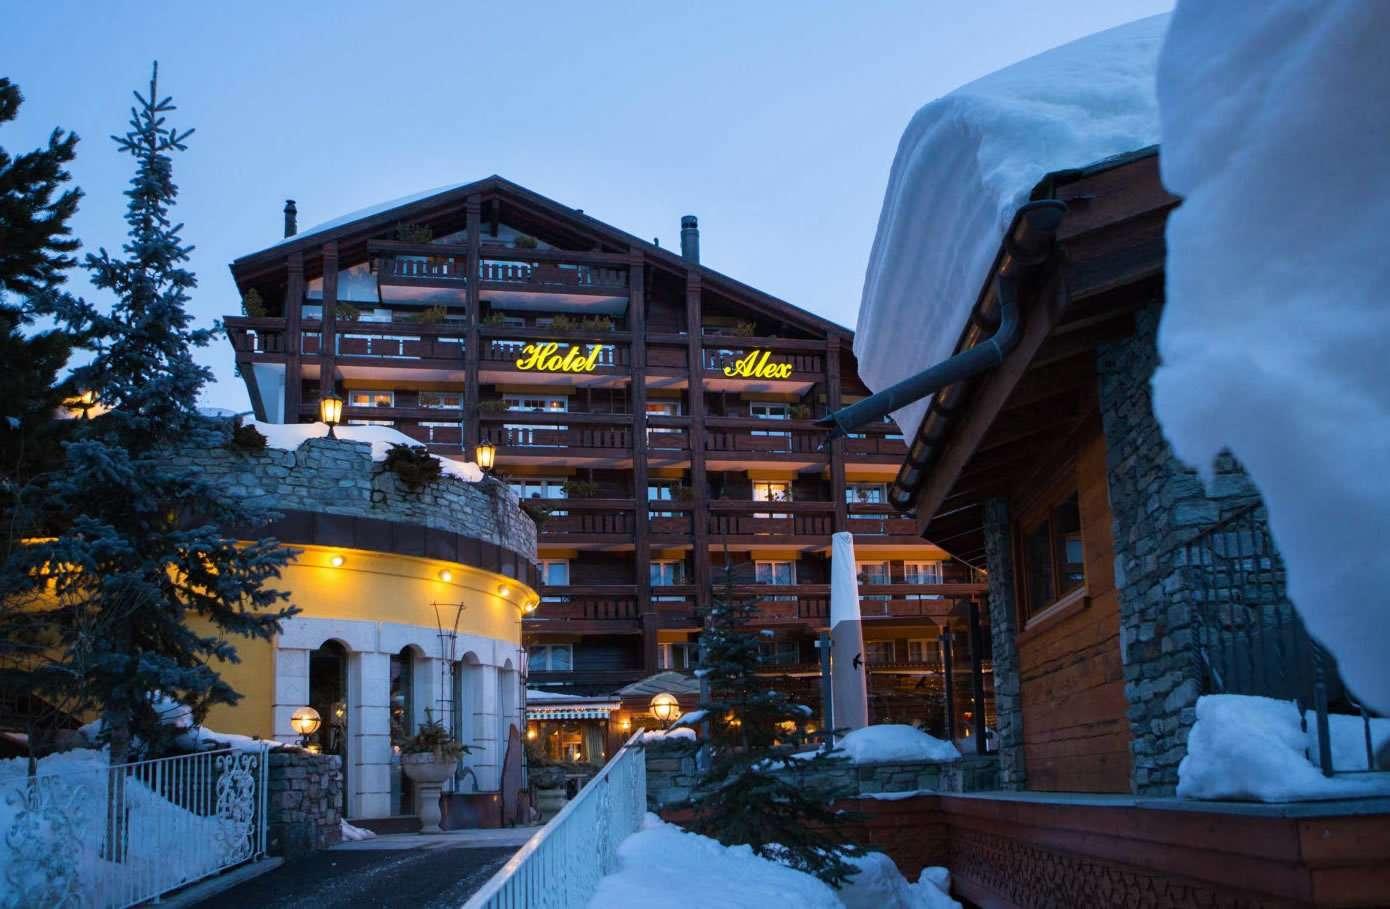 Visit the HOTEL ALEX